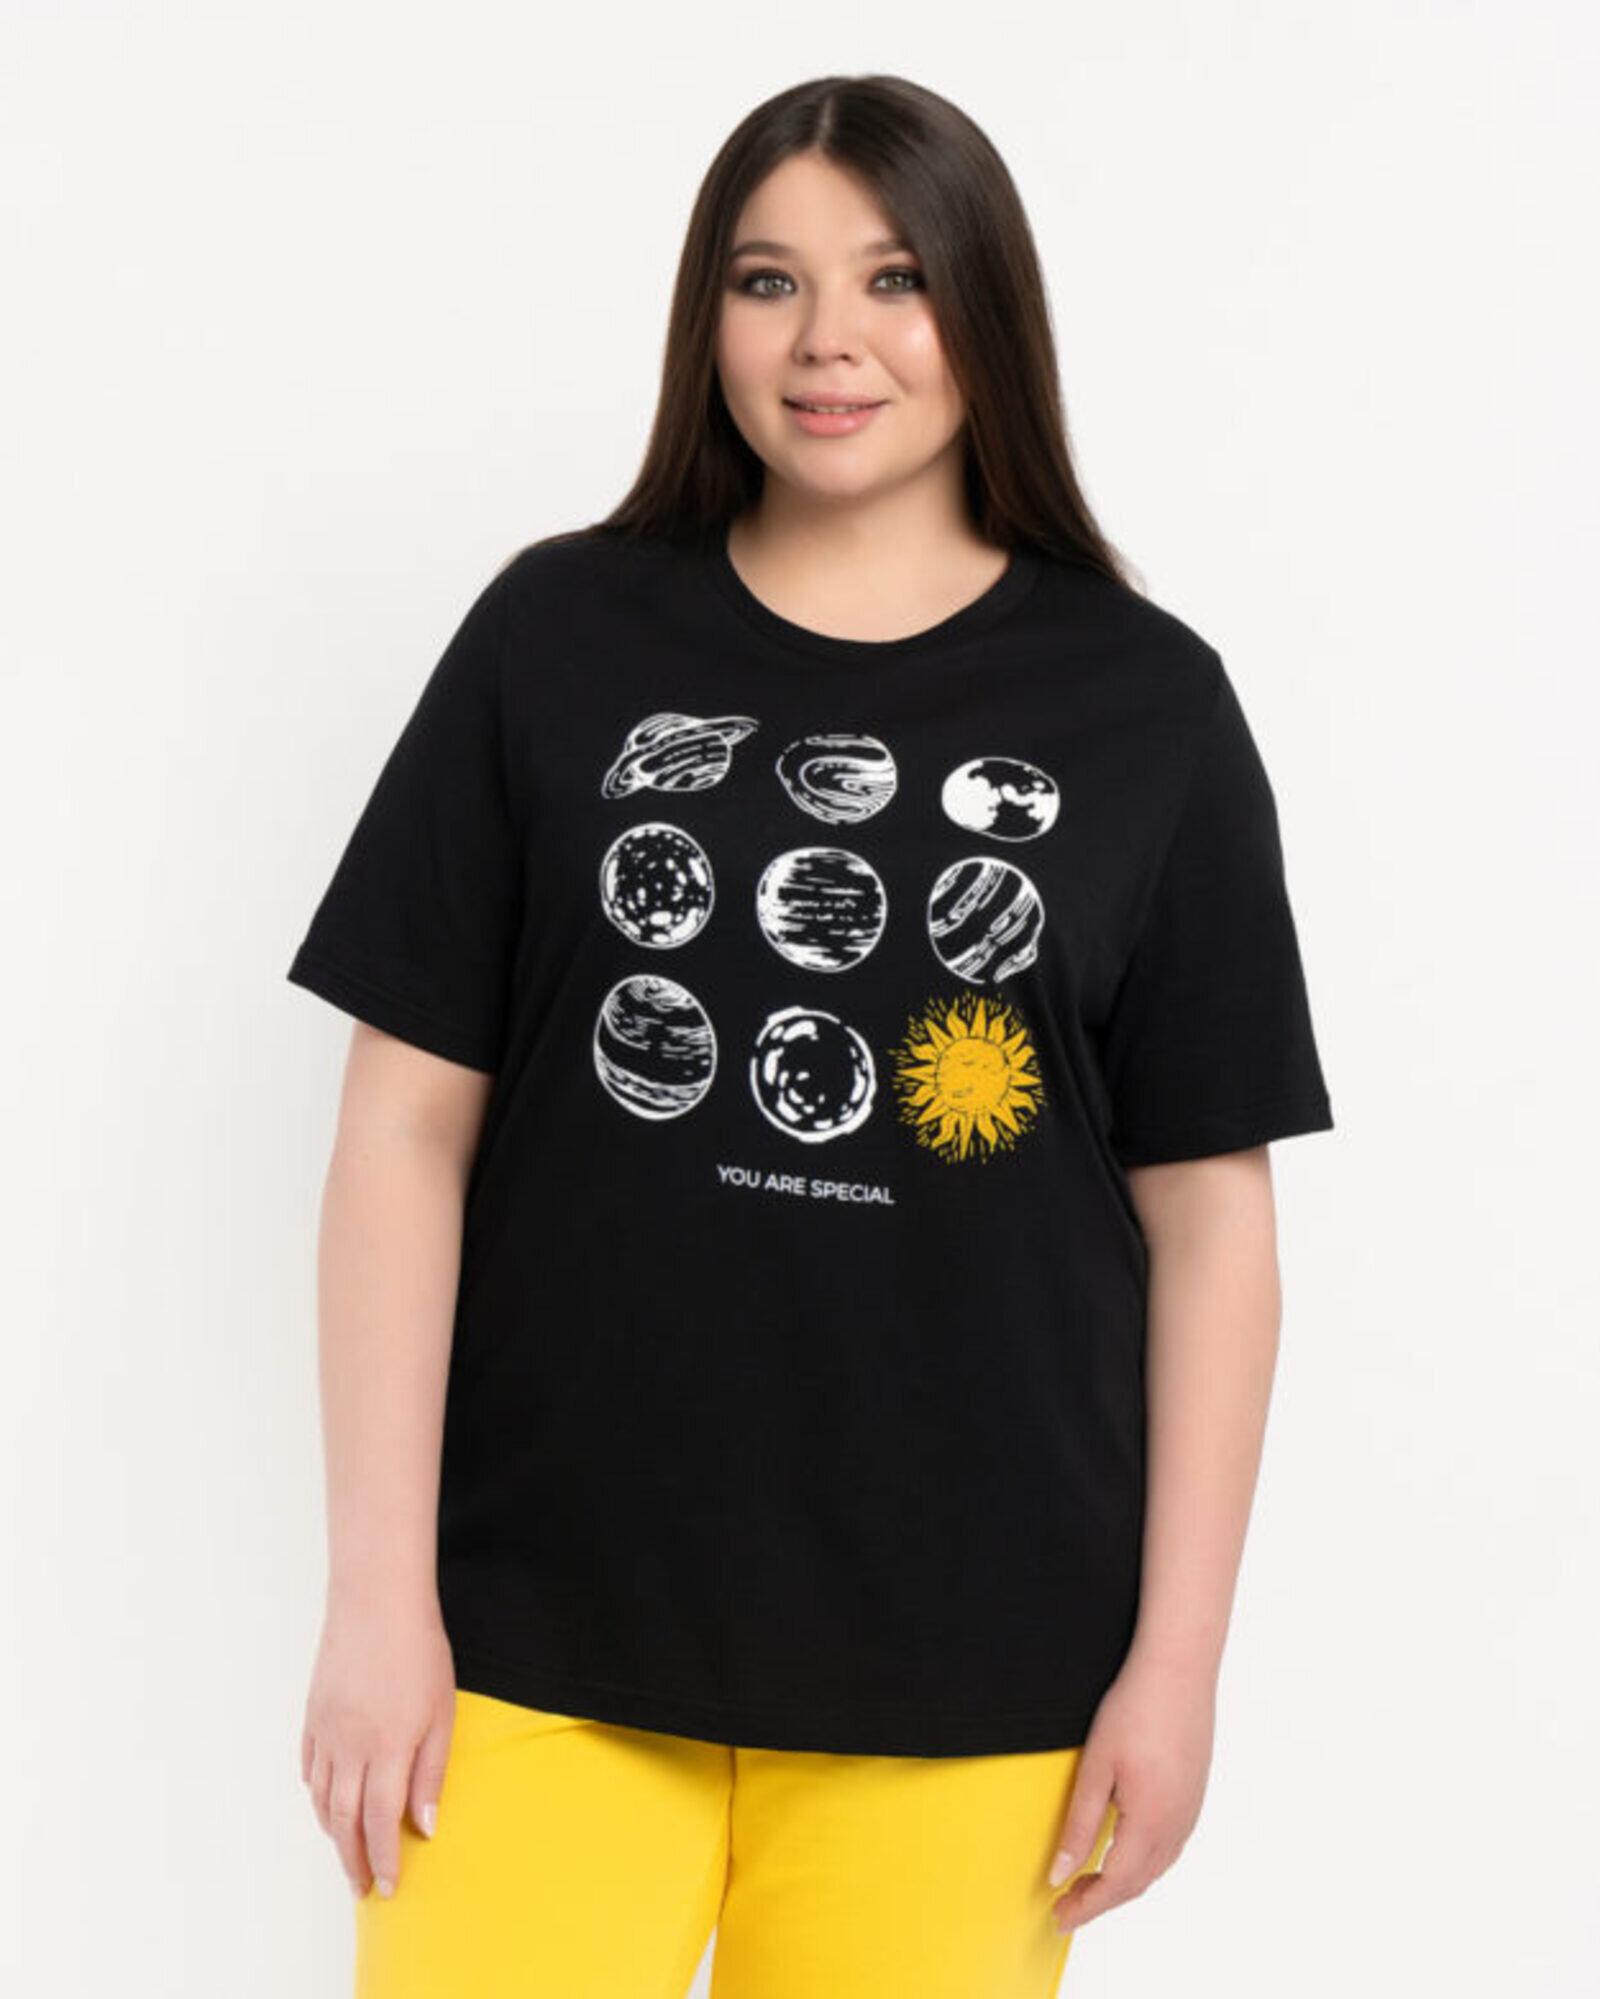 Футболка женская «Солнце» черная Plus size